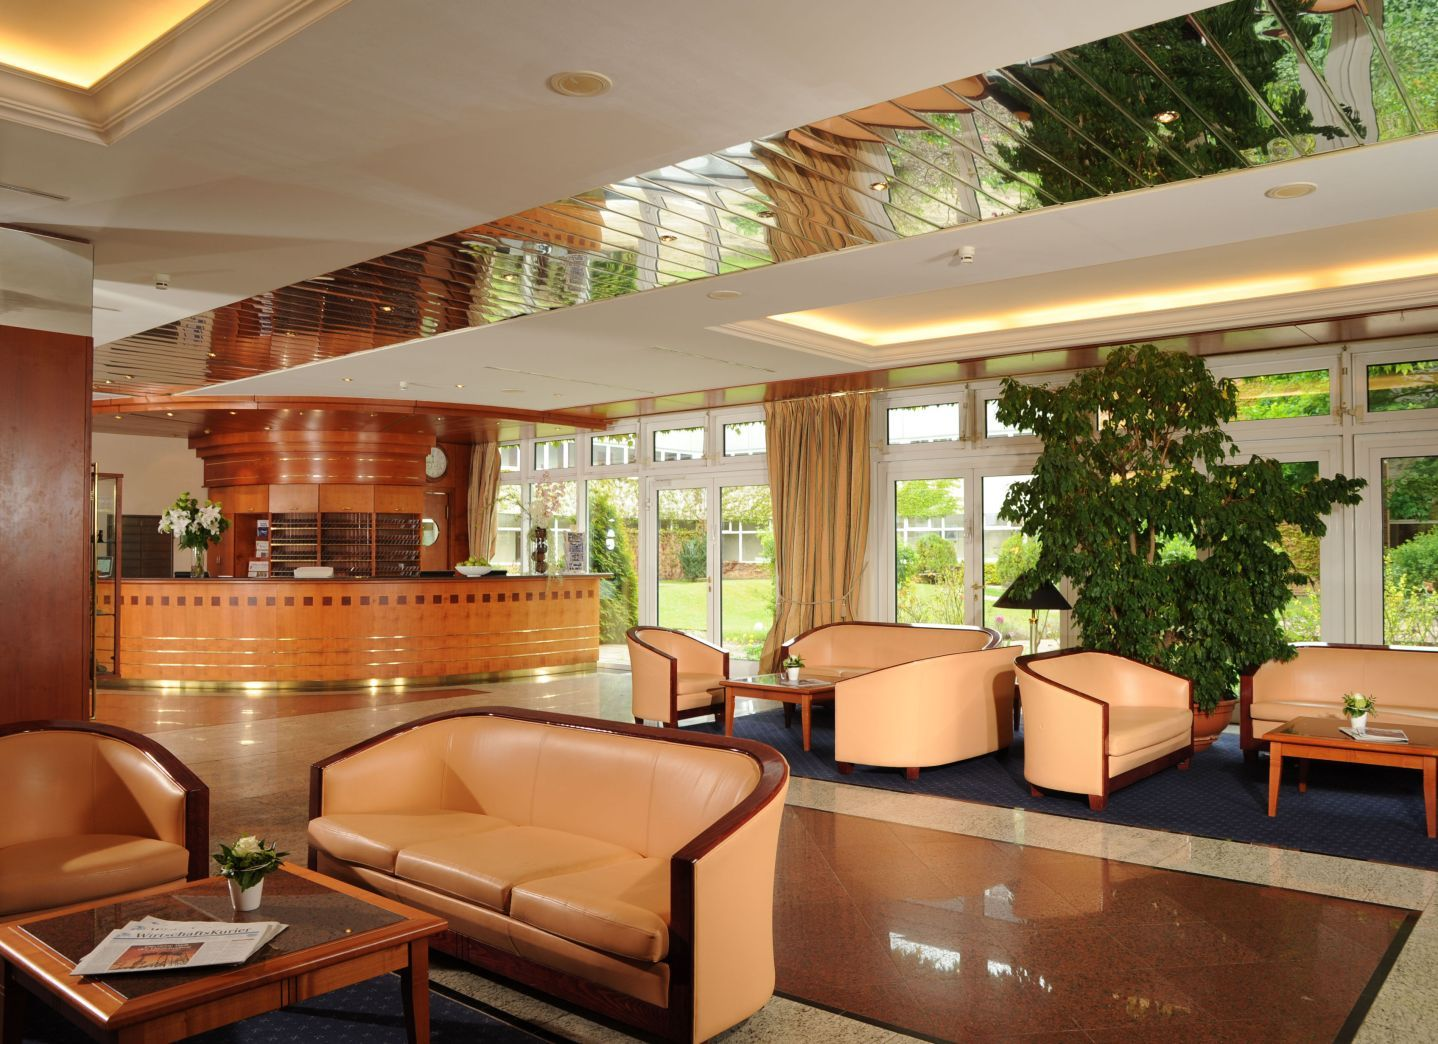 The 4stars Hotel Müggelsee Berlin is idyllic situated